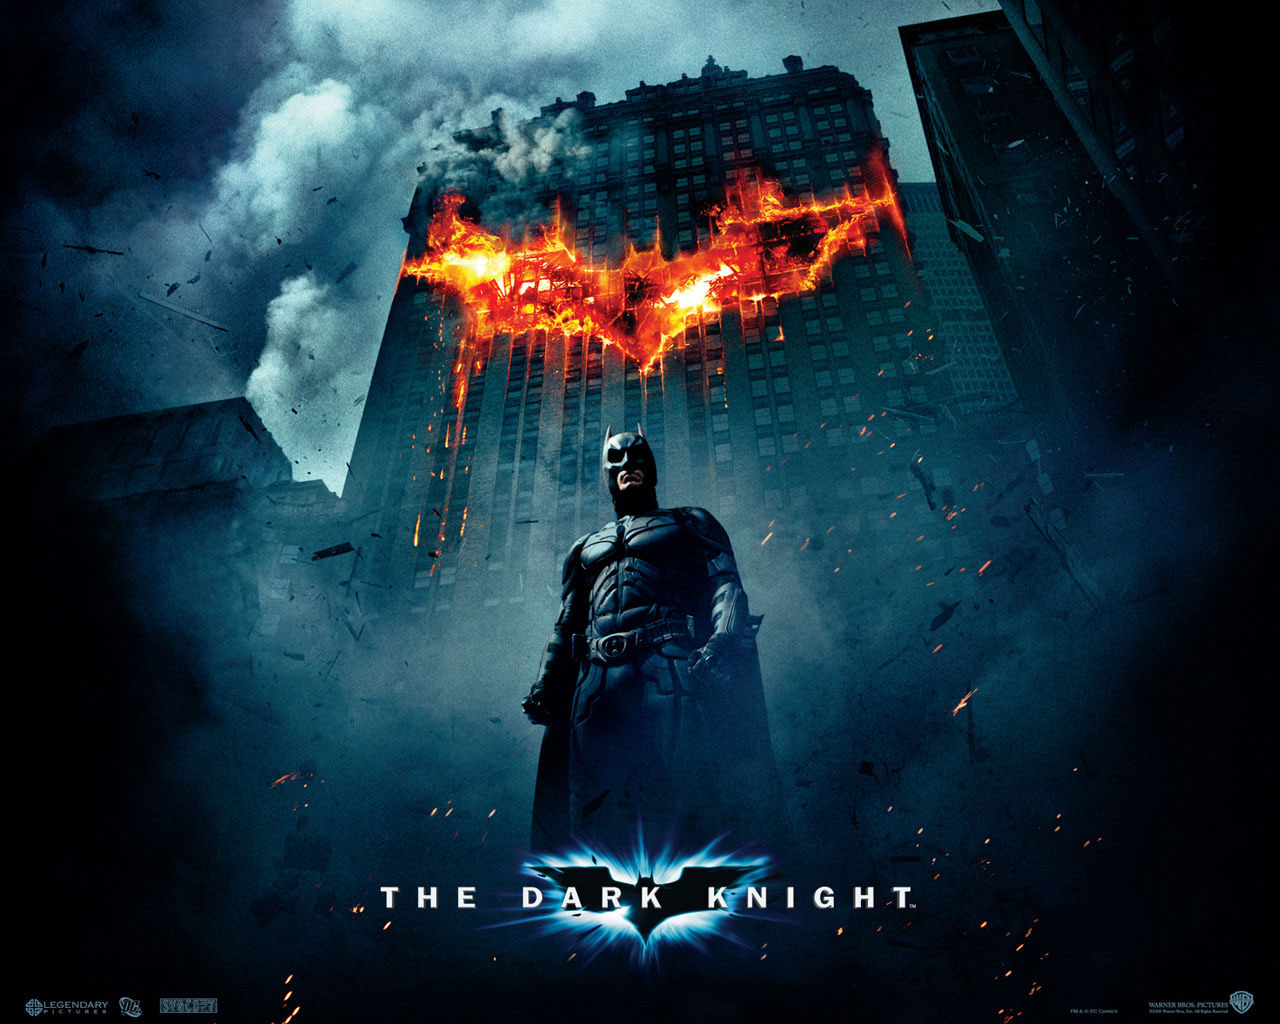 http://4.bp.blogspot.com/-splHBpVMbNs/UBvZy7uGPmI/AAAAAAAAAXw/itPEKhJx9KY/s1600/Batman16-233175.jpeg